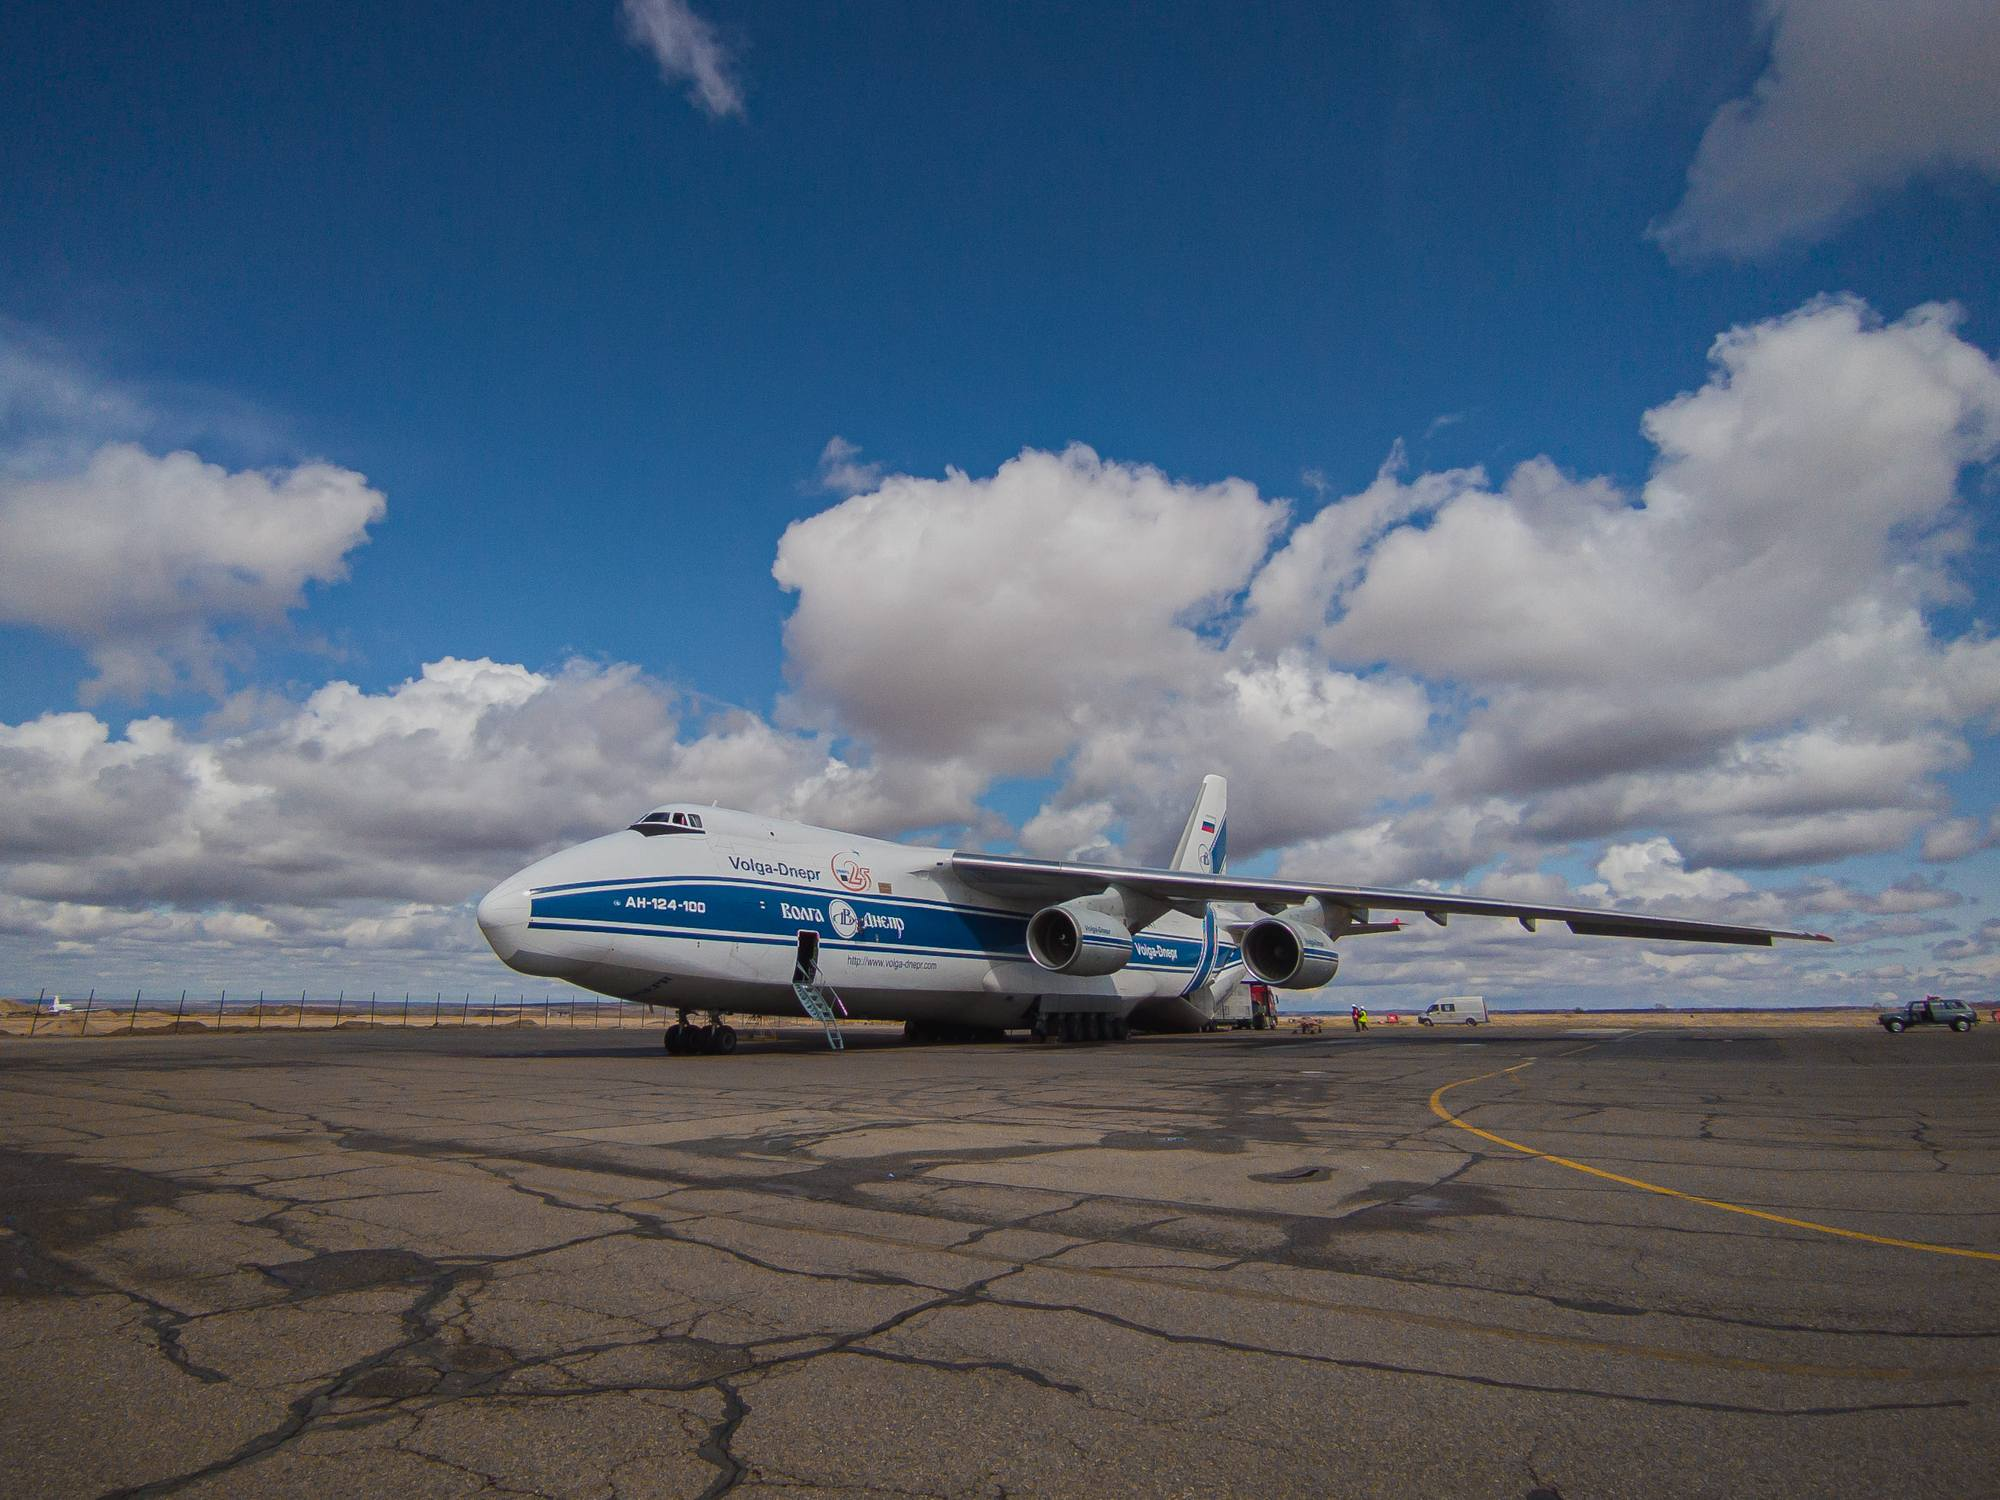 L'Antonov 124-100 de la compagnie Volga-Dniepr transportant les satellites OneWeb sur le tarmac de l'aéroport d'Ignatievo.